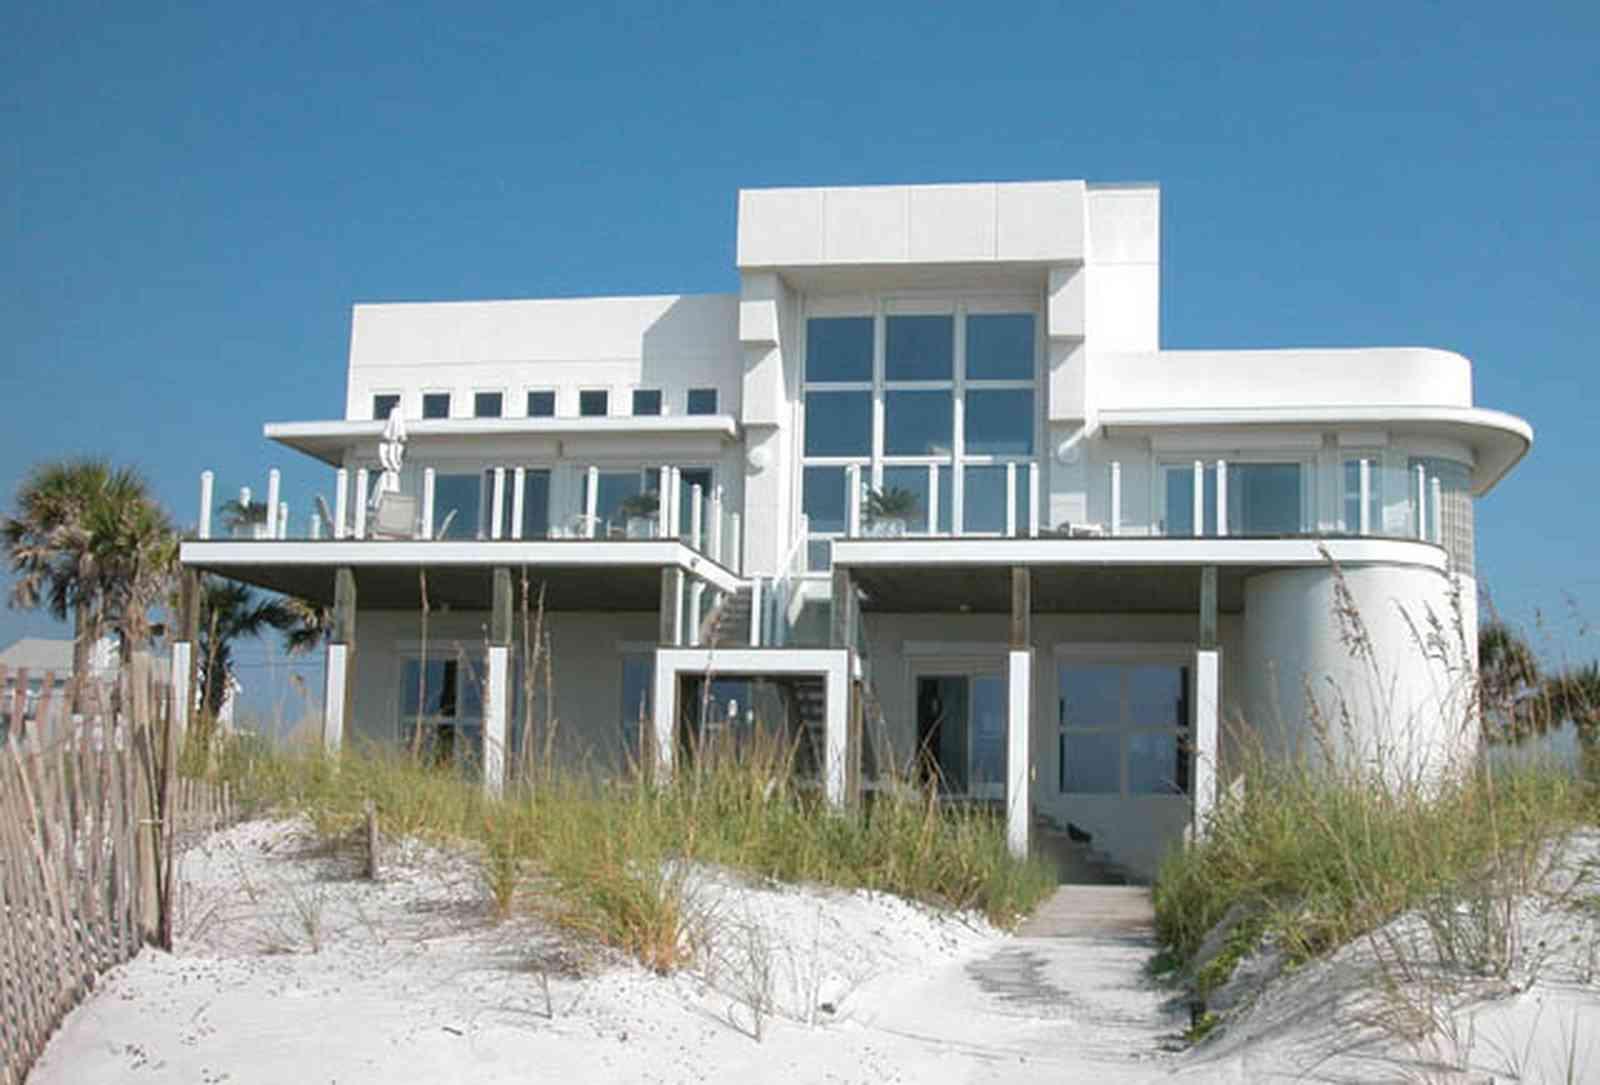 Luxurious Pensacola Beach Ariola Drive Art Deco House 01 Art Deco House Decor Art Deco House Los Angeles curbed Art Deco House